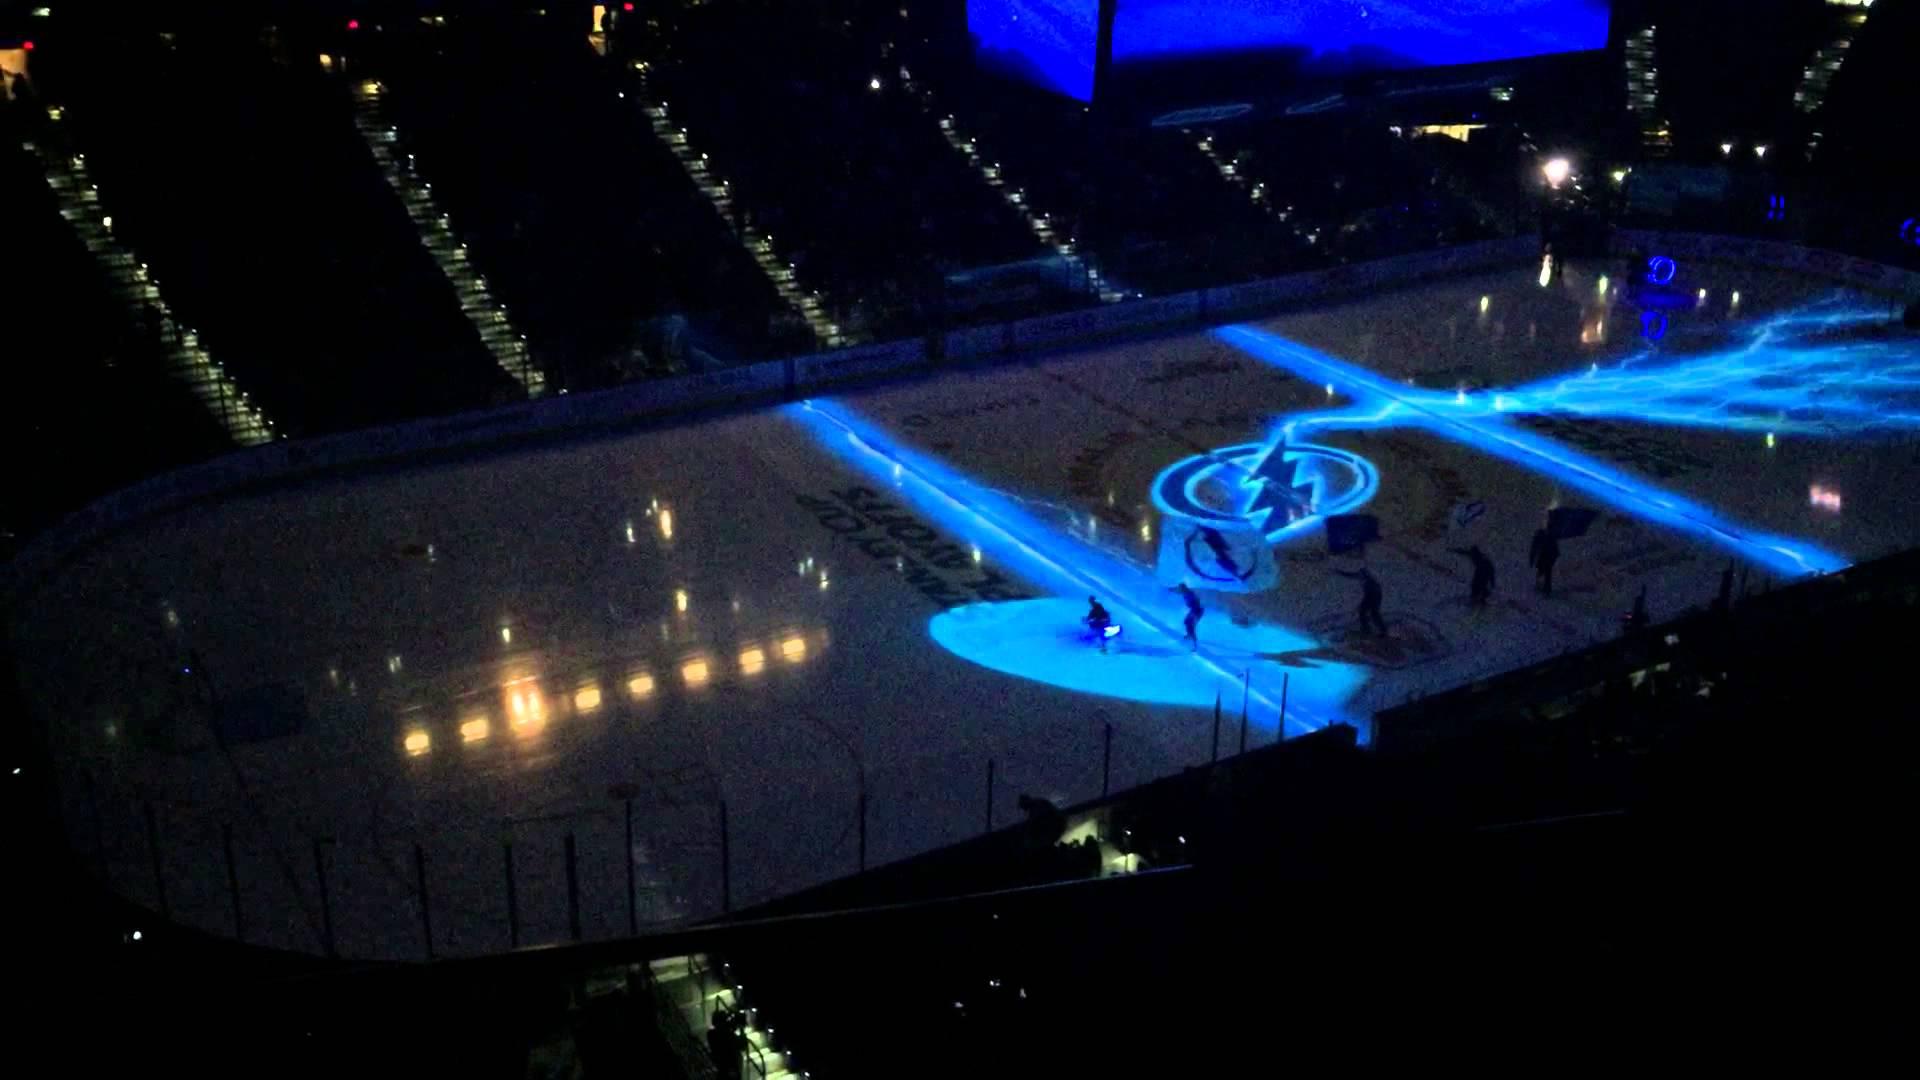 Video 2015 T&a Bay Lightning Pregame Wow Hockey Squawk & Lighting Hockey - Democraciaejustica